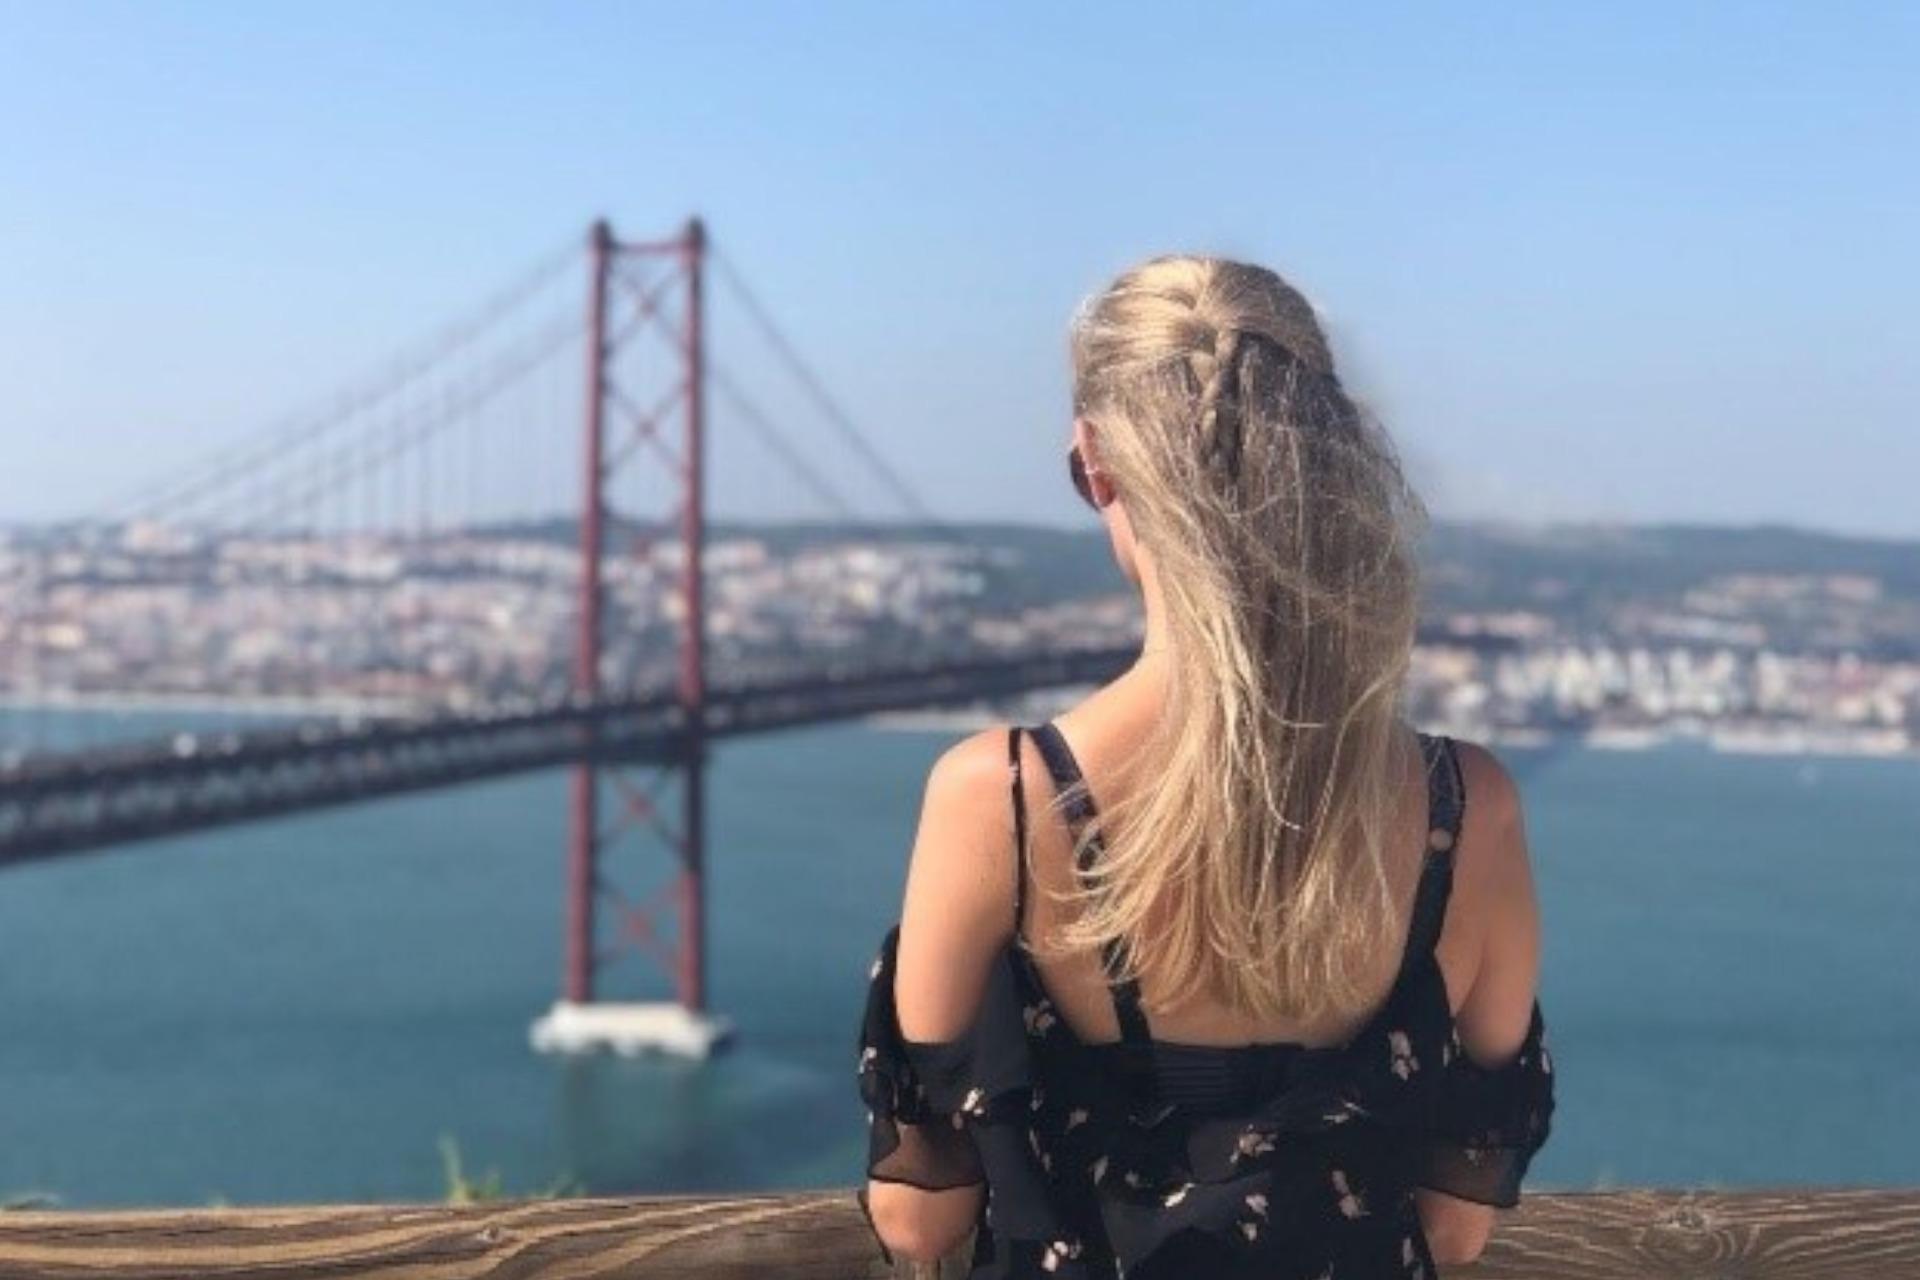 Foto de Lisa Penelope, aluna de Erasmus de costas a olhar para a Ponte 25 de Abril e para o Rio Tejo.